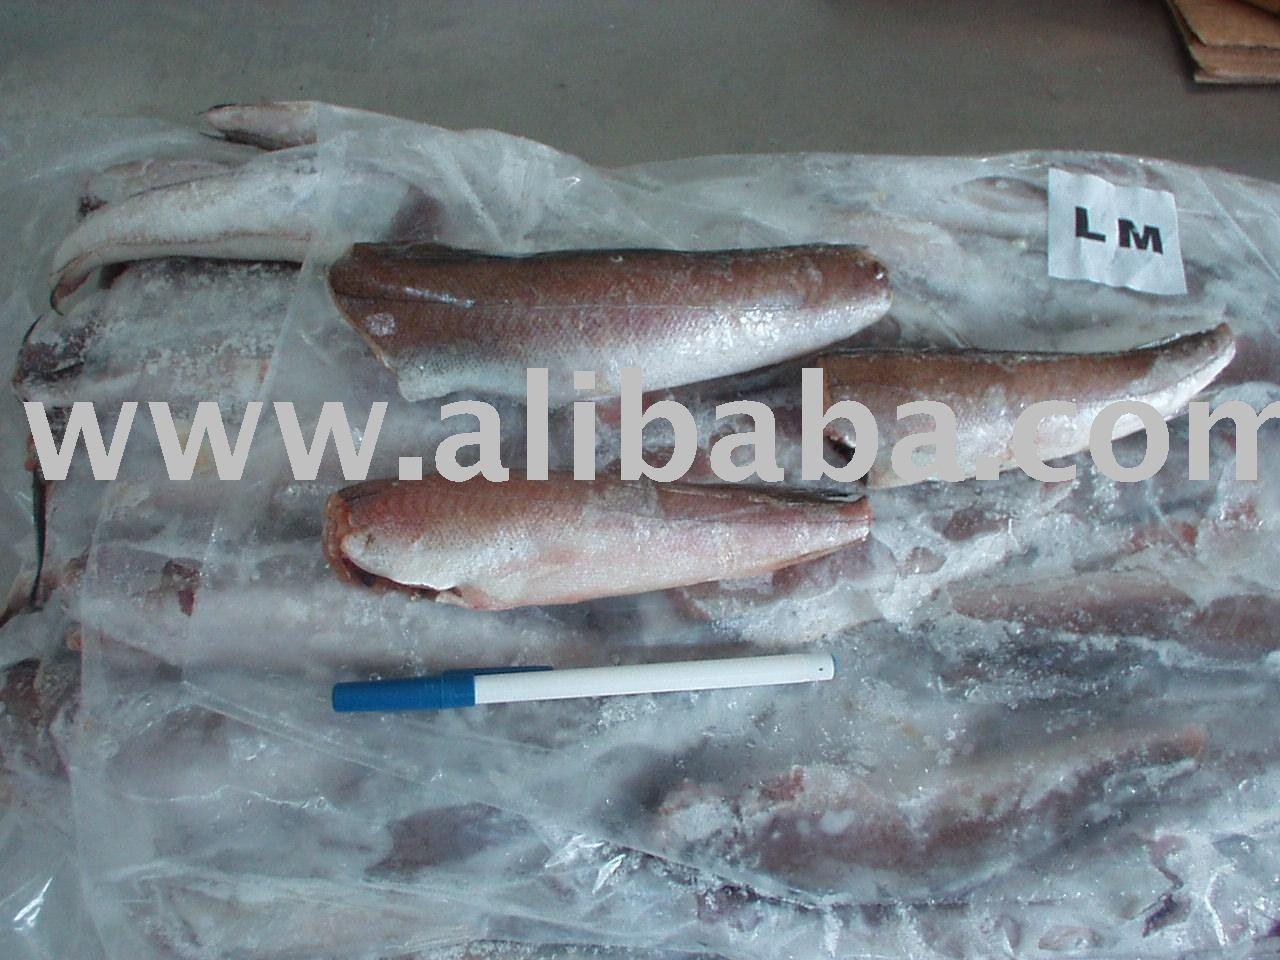 Croaker fish fillet - photo#28